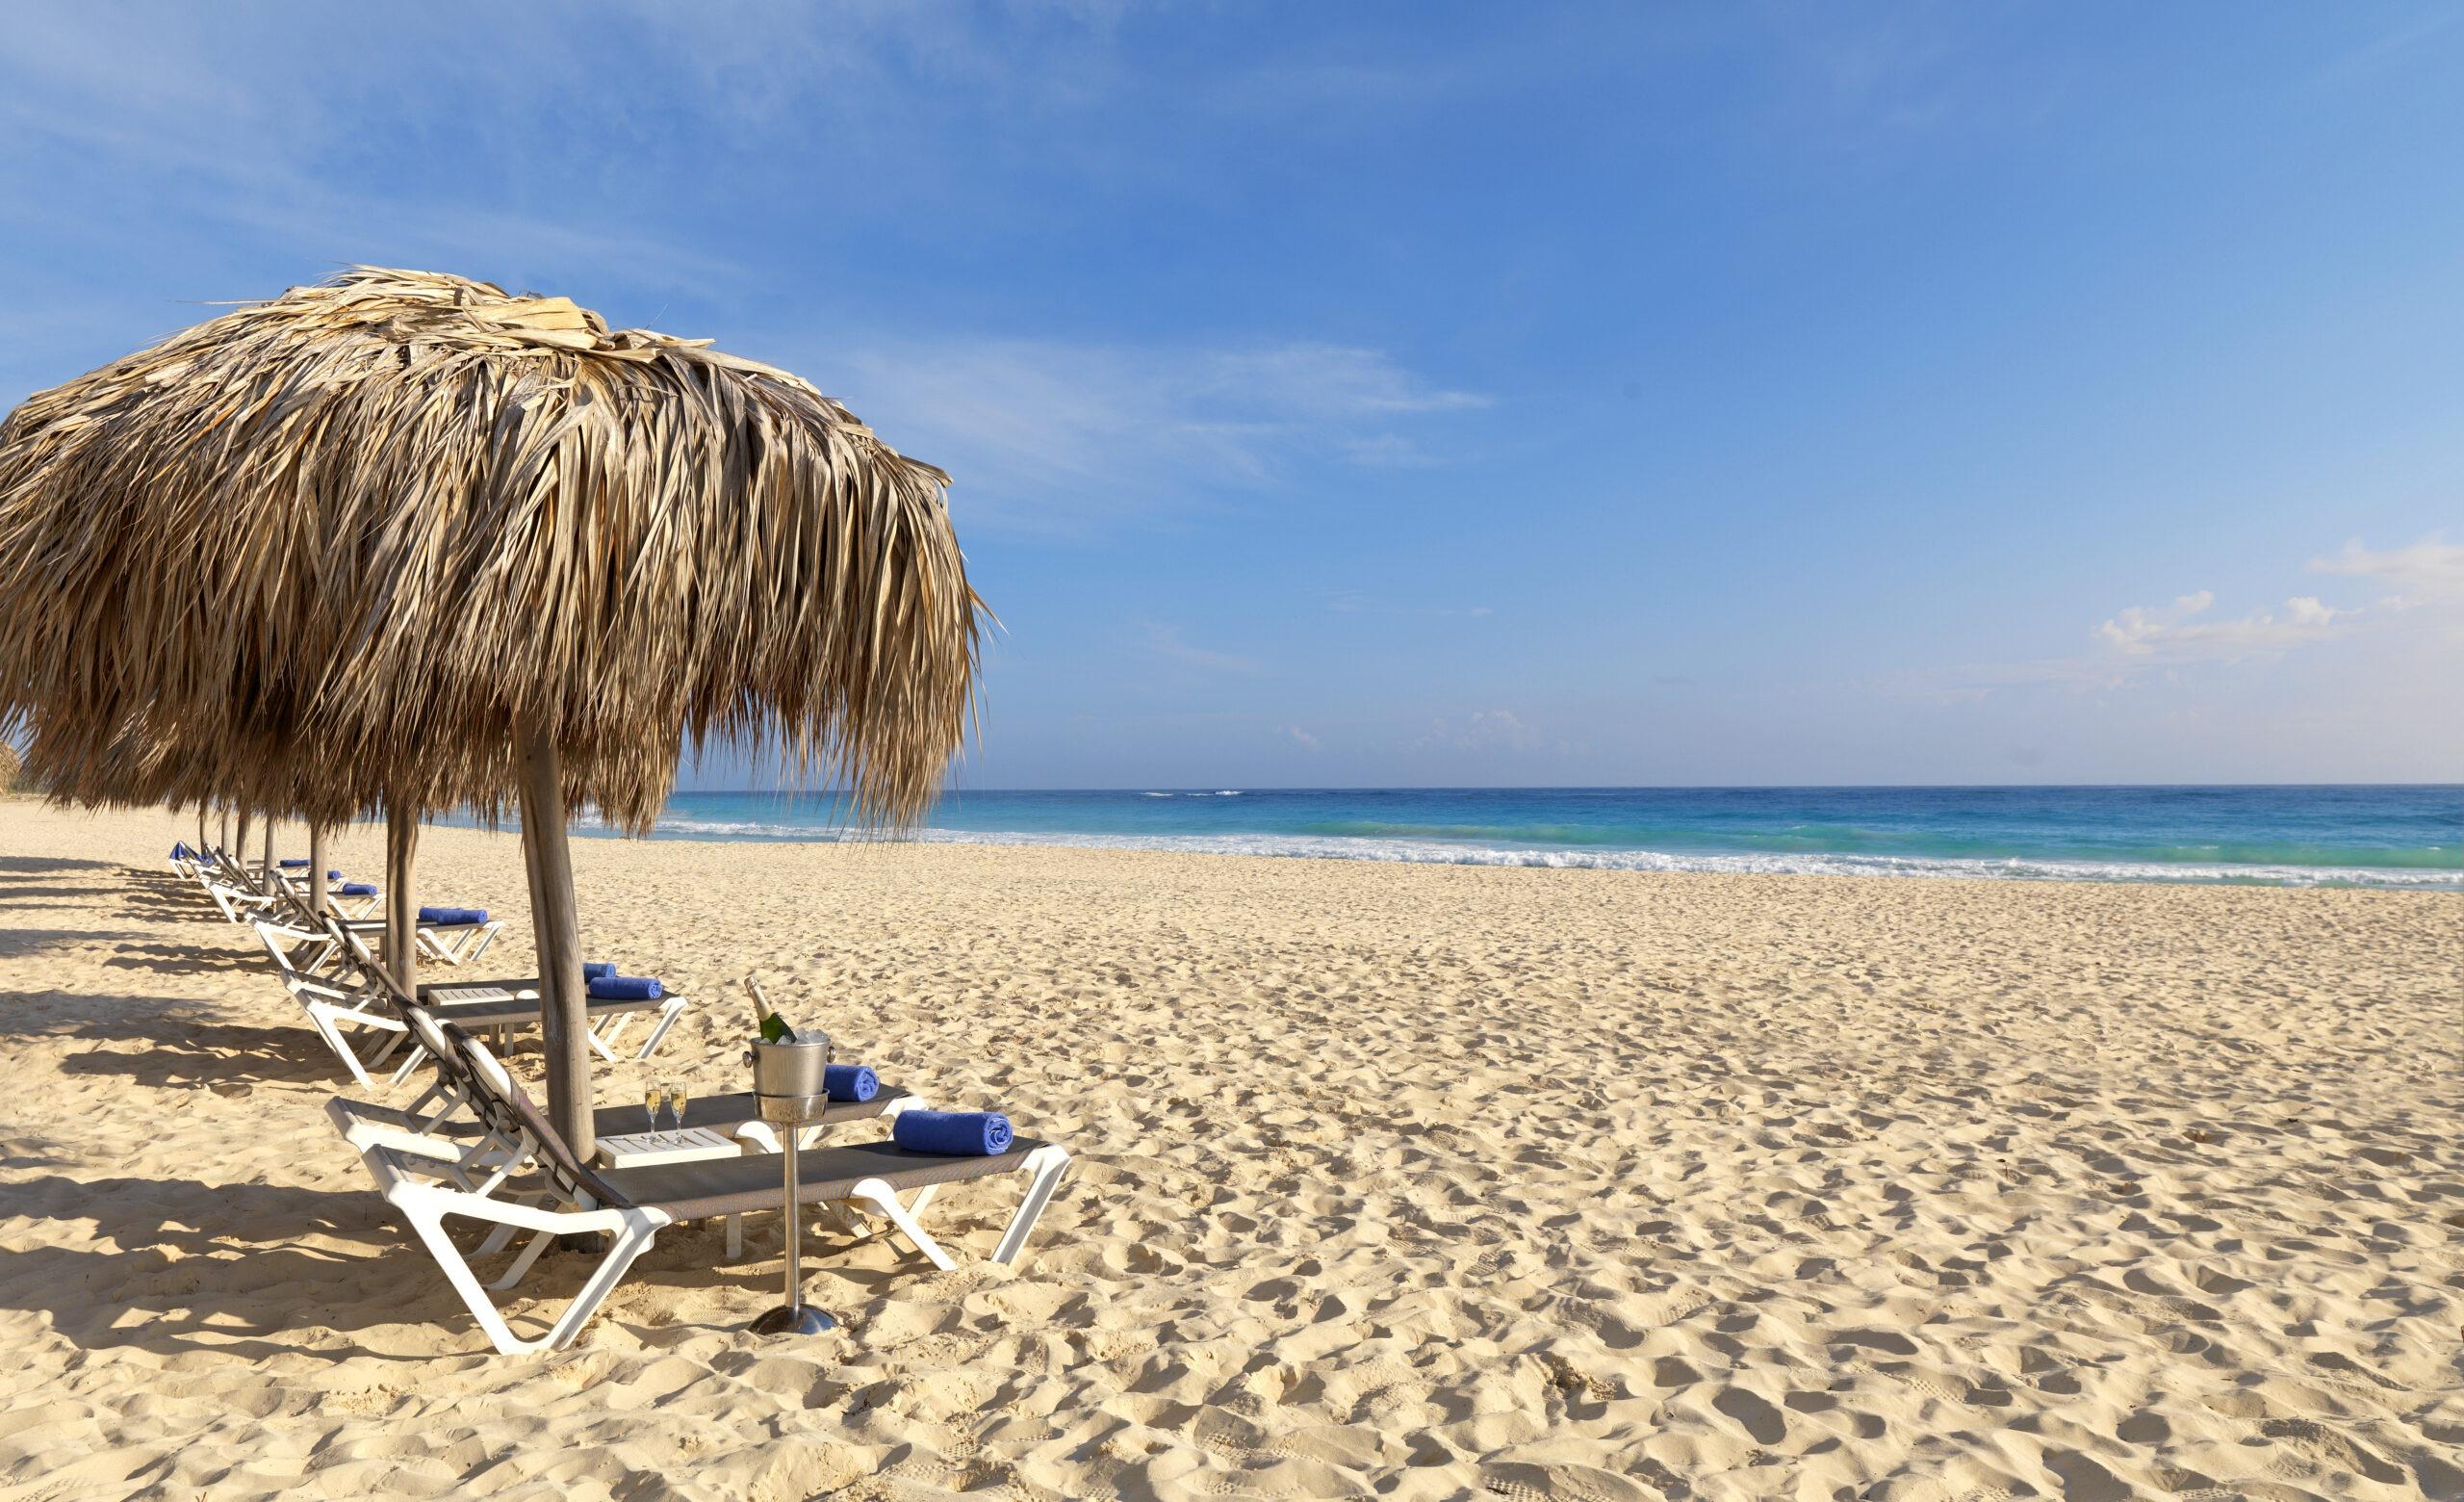 HRHPC_Toro Beach_8489448